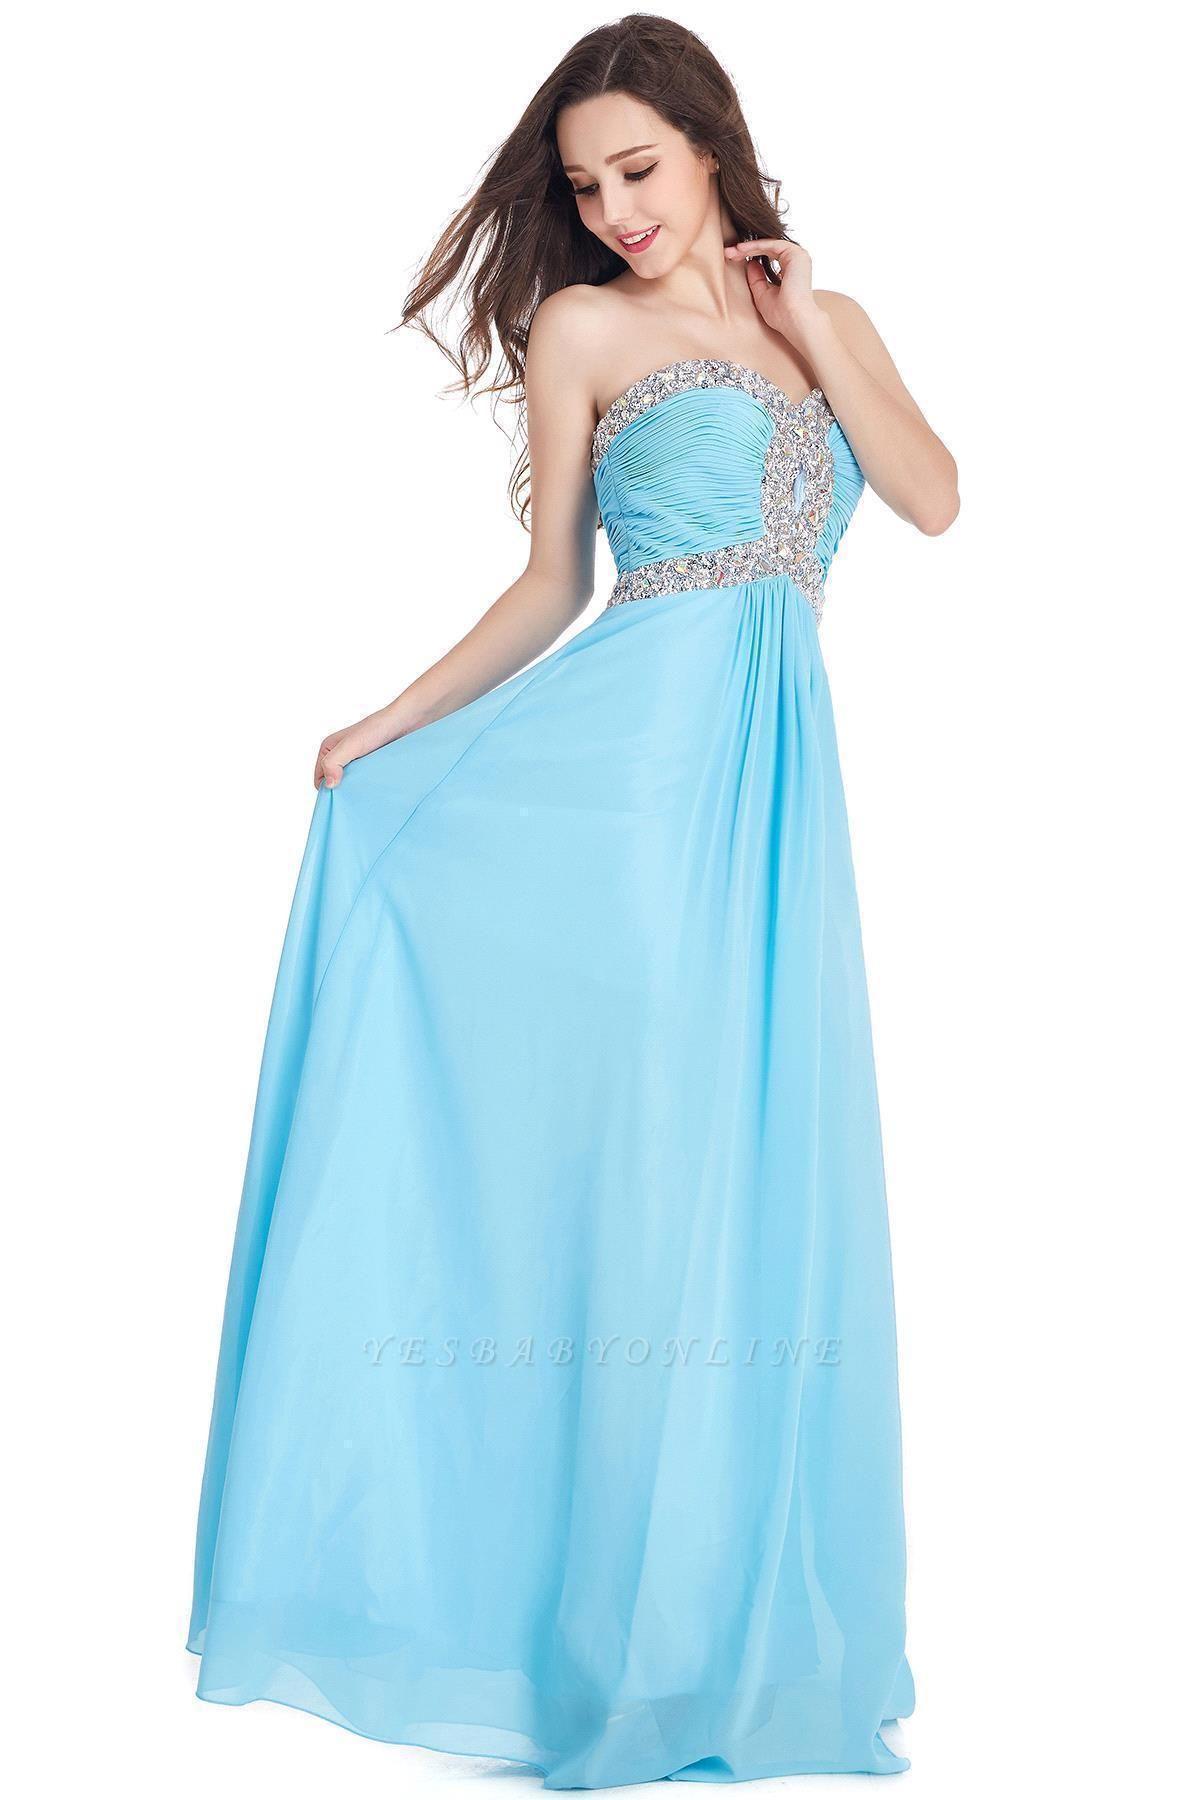 CRYSTAL | Sheath Floor-Length Sweetheart Chiffon Prom Dresses with Crystals